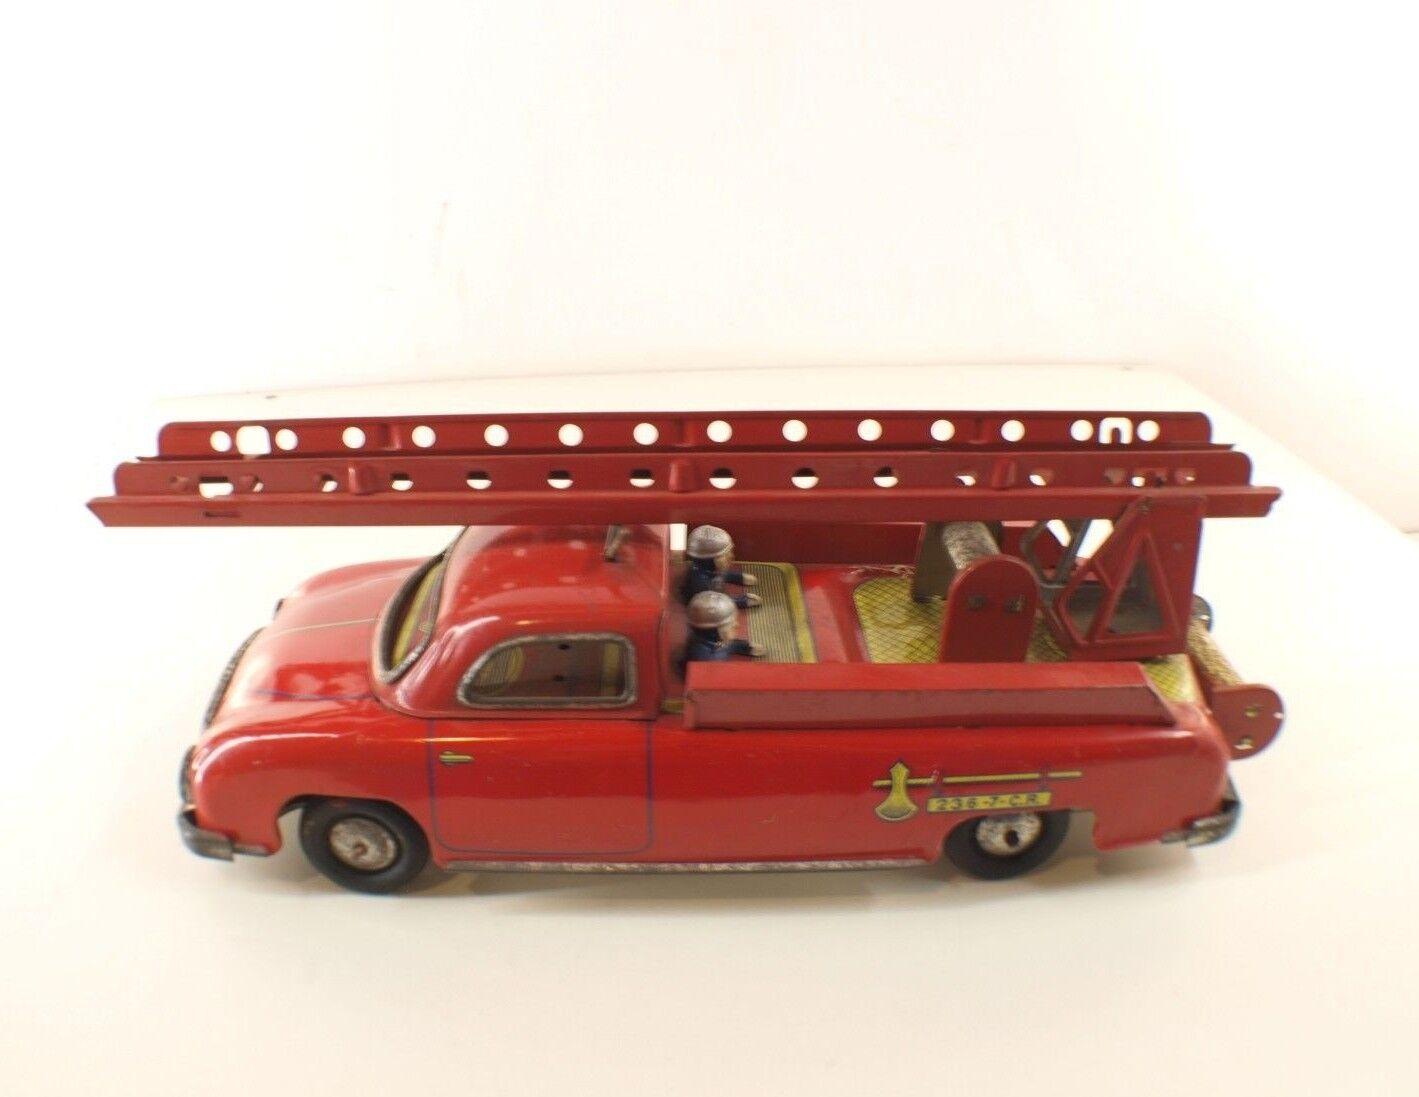 Cr Charles Rossignol 236-7 Delahaye Pompieri Motore Set Metallo Tin Giocattolo